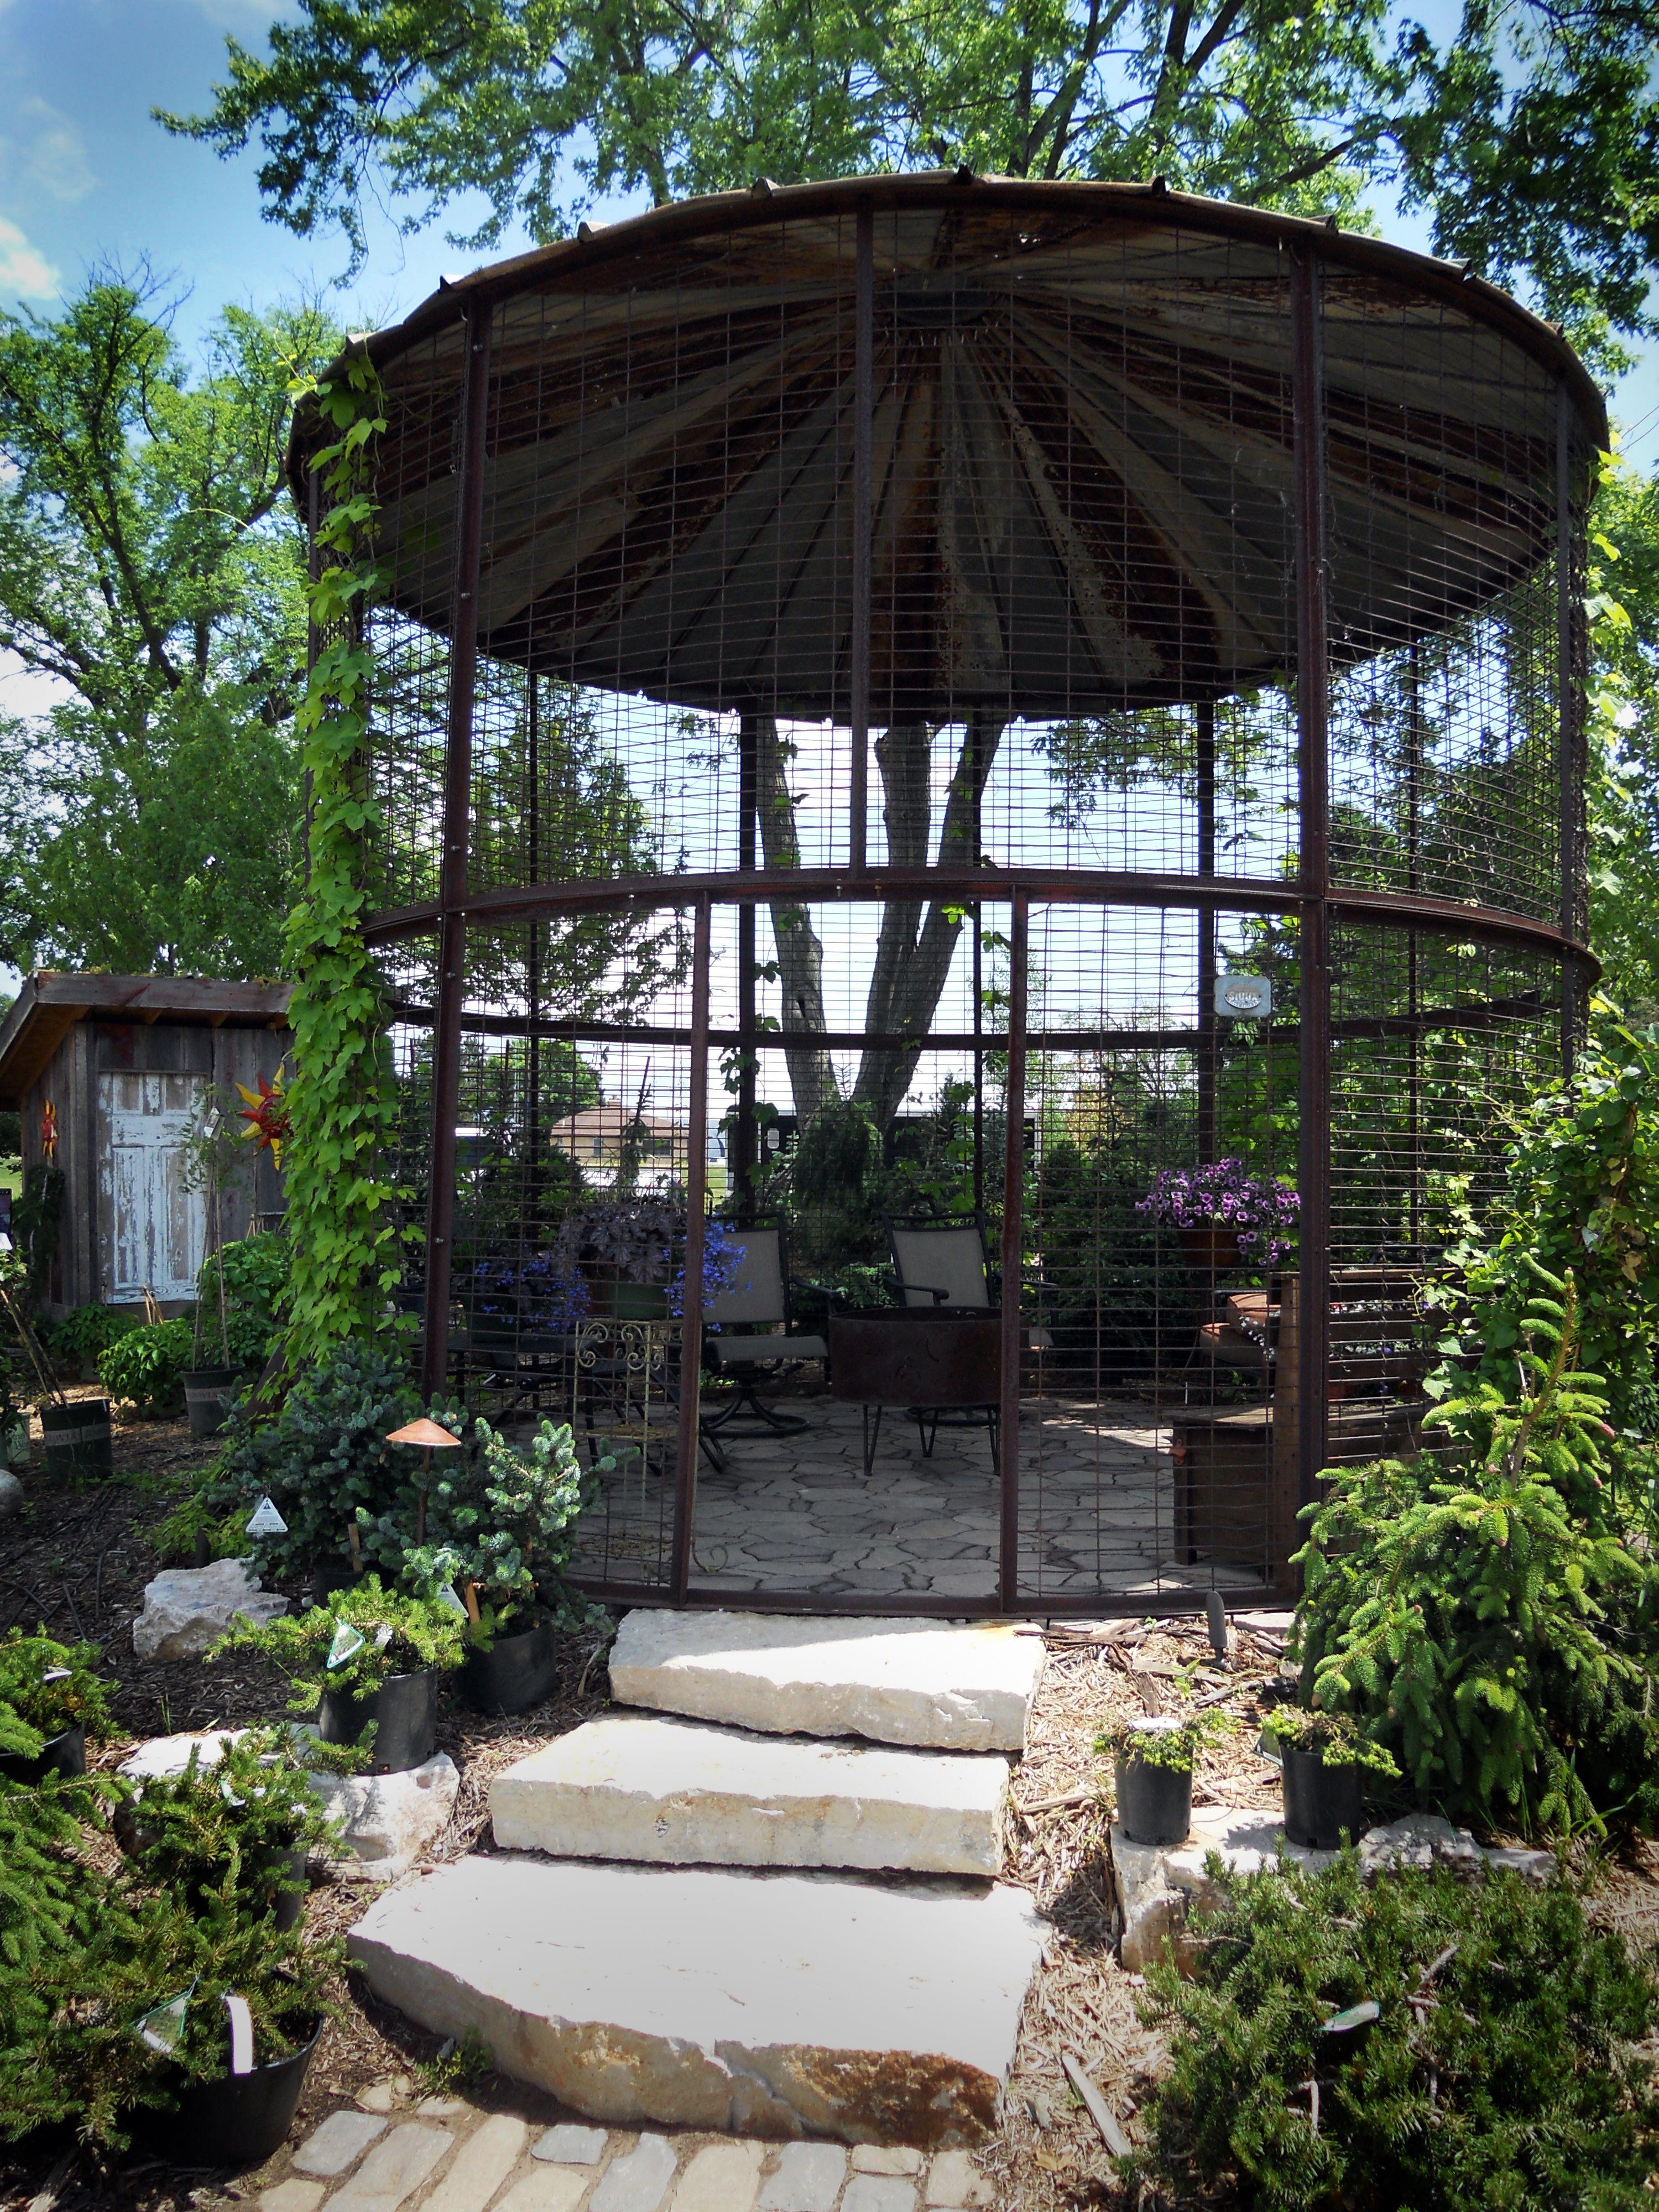 Pin by jacque zweygardt on grain bin homes pinterest for Gazebo chicken coop